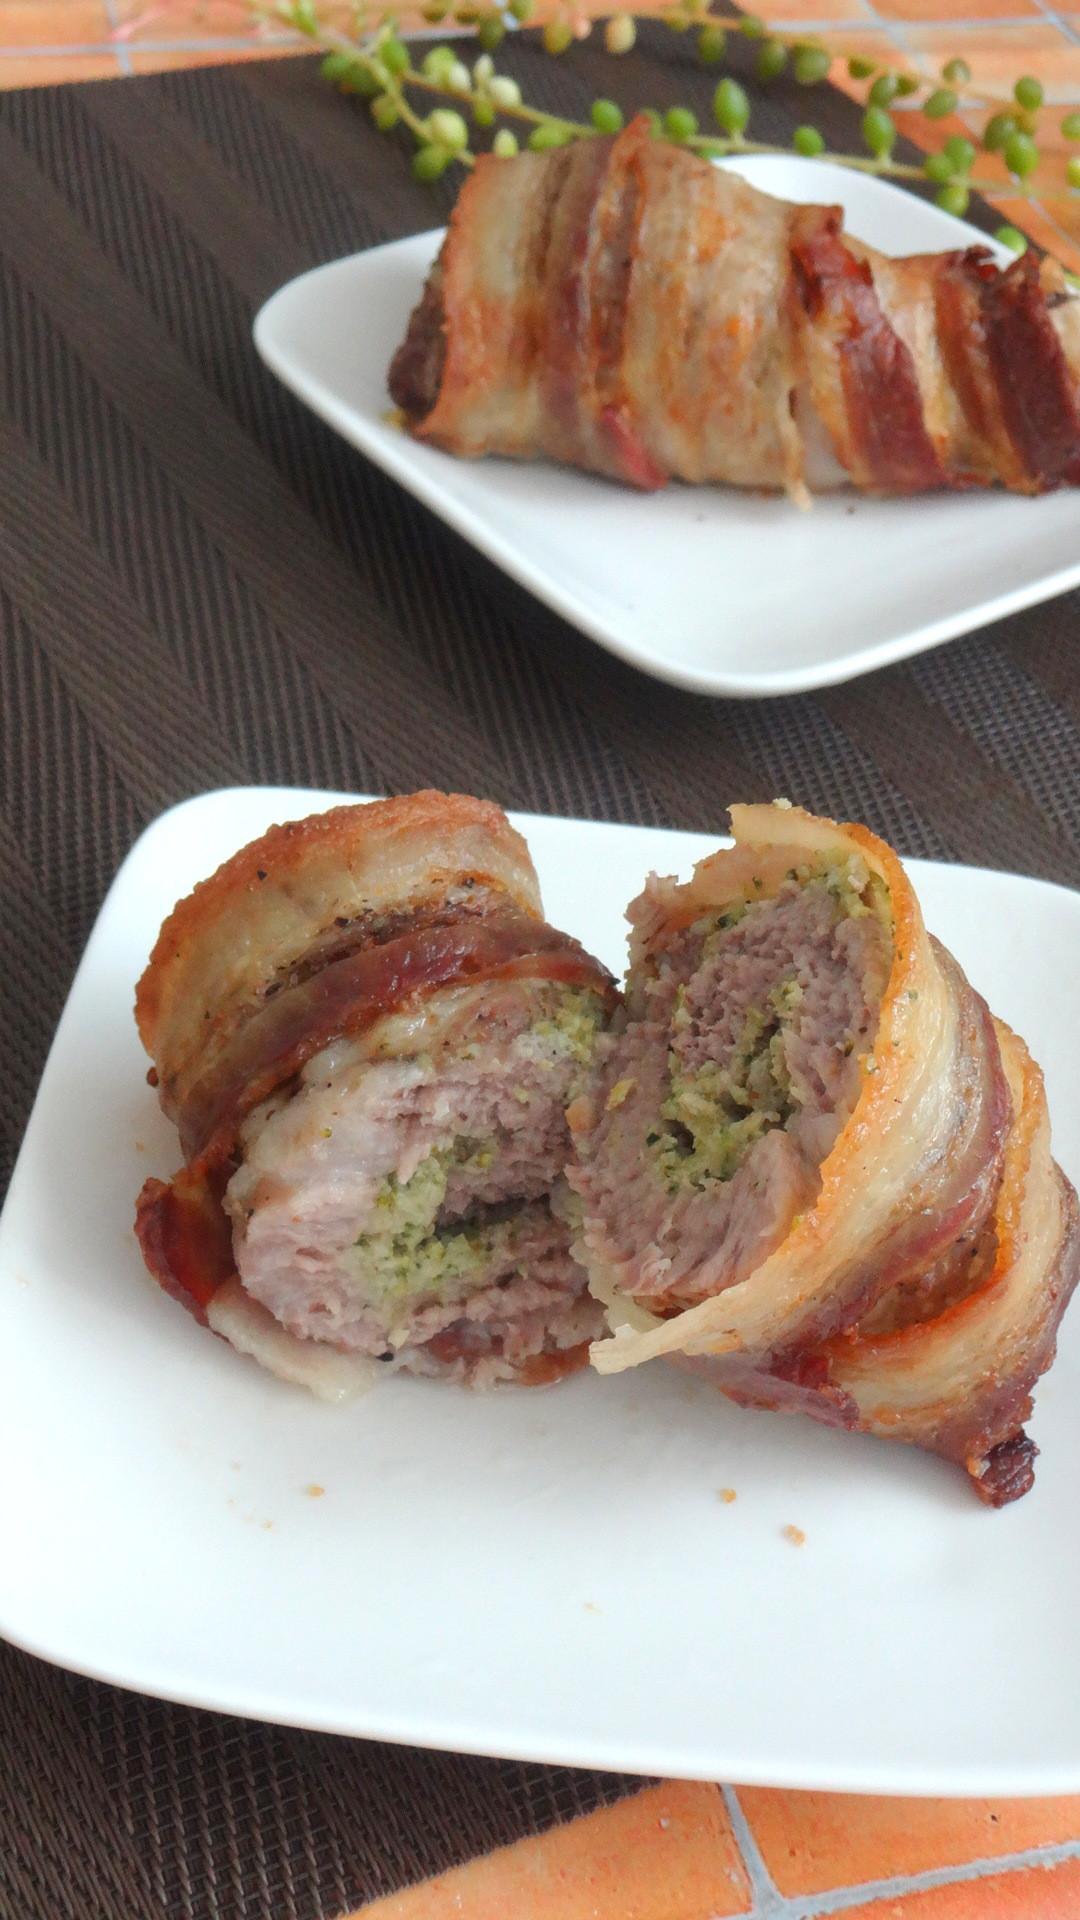 Keto Diet Pork Chops  Bacon Wrapped Broccoli Stuffed Pork Chops Keto Low Carb